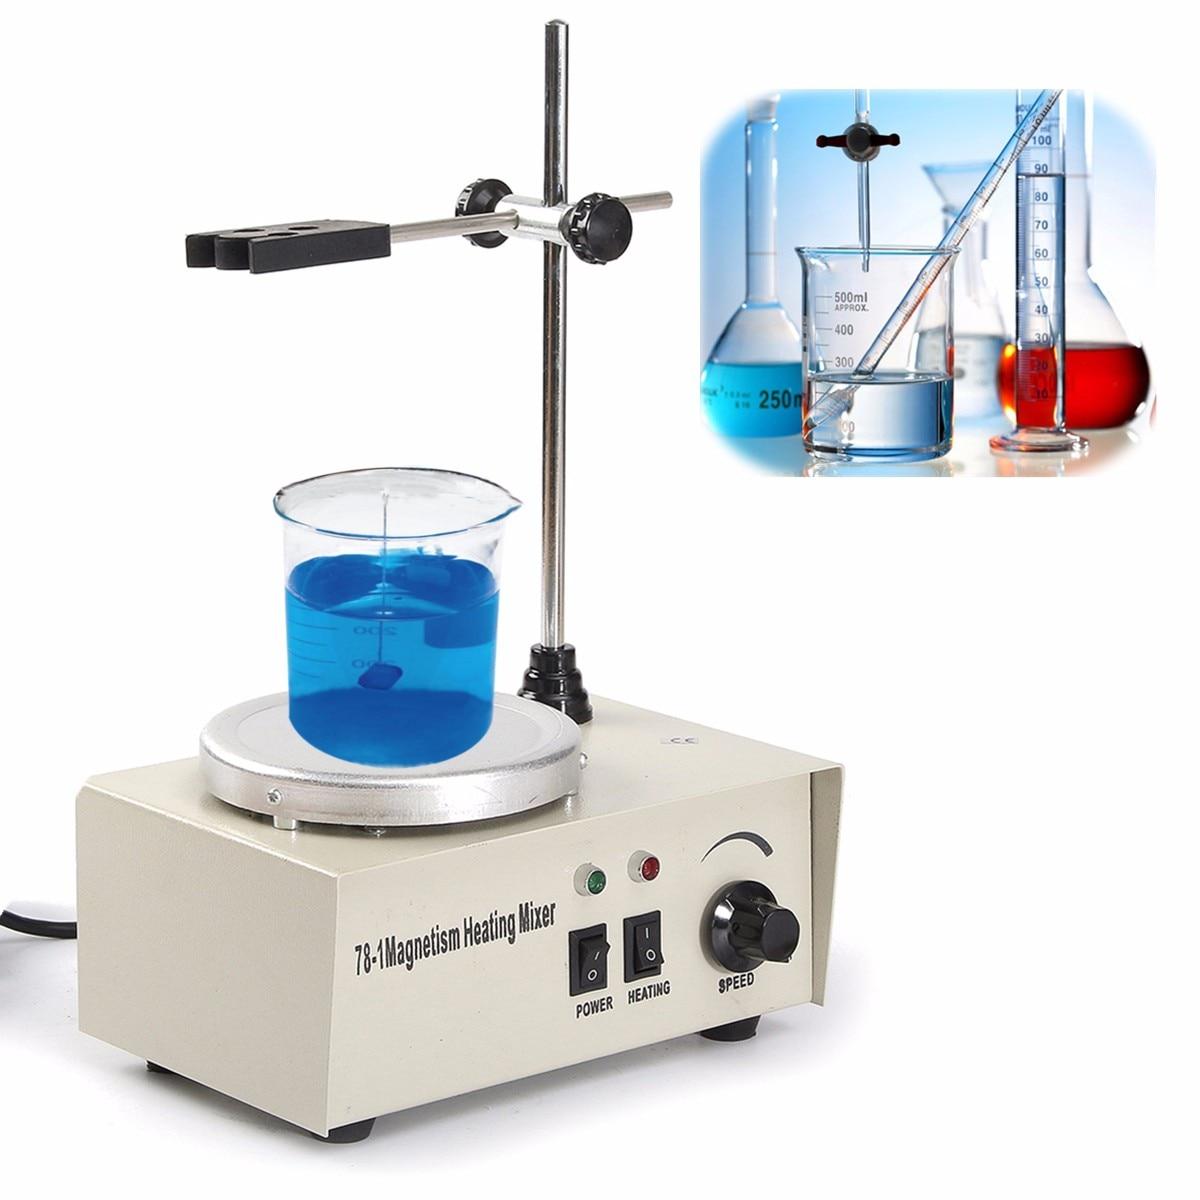 KiCute Laboratory Chemistry Magnetic Stirrer Magnetic Stirrer Lab Magnetic Mixer Stirrers Apparatus 220V 50HZ Lab Supplies цена